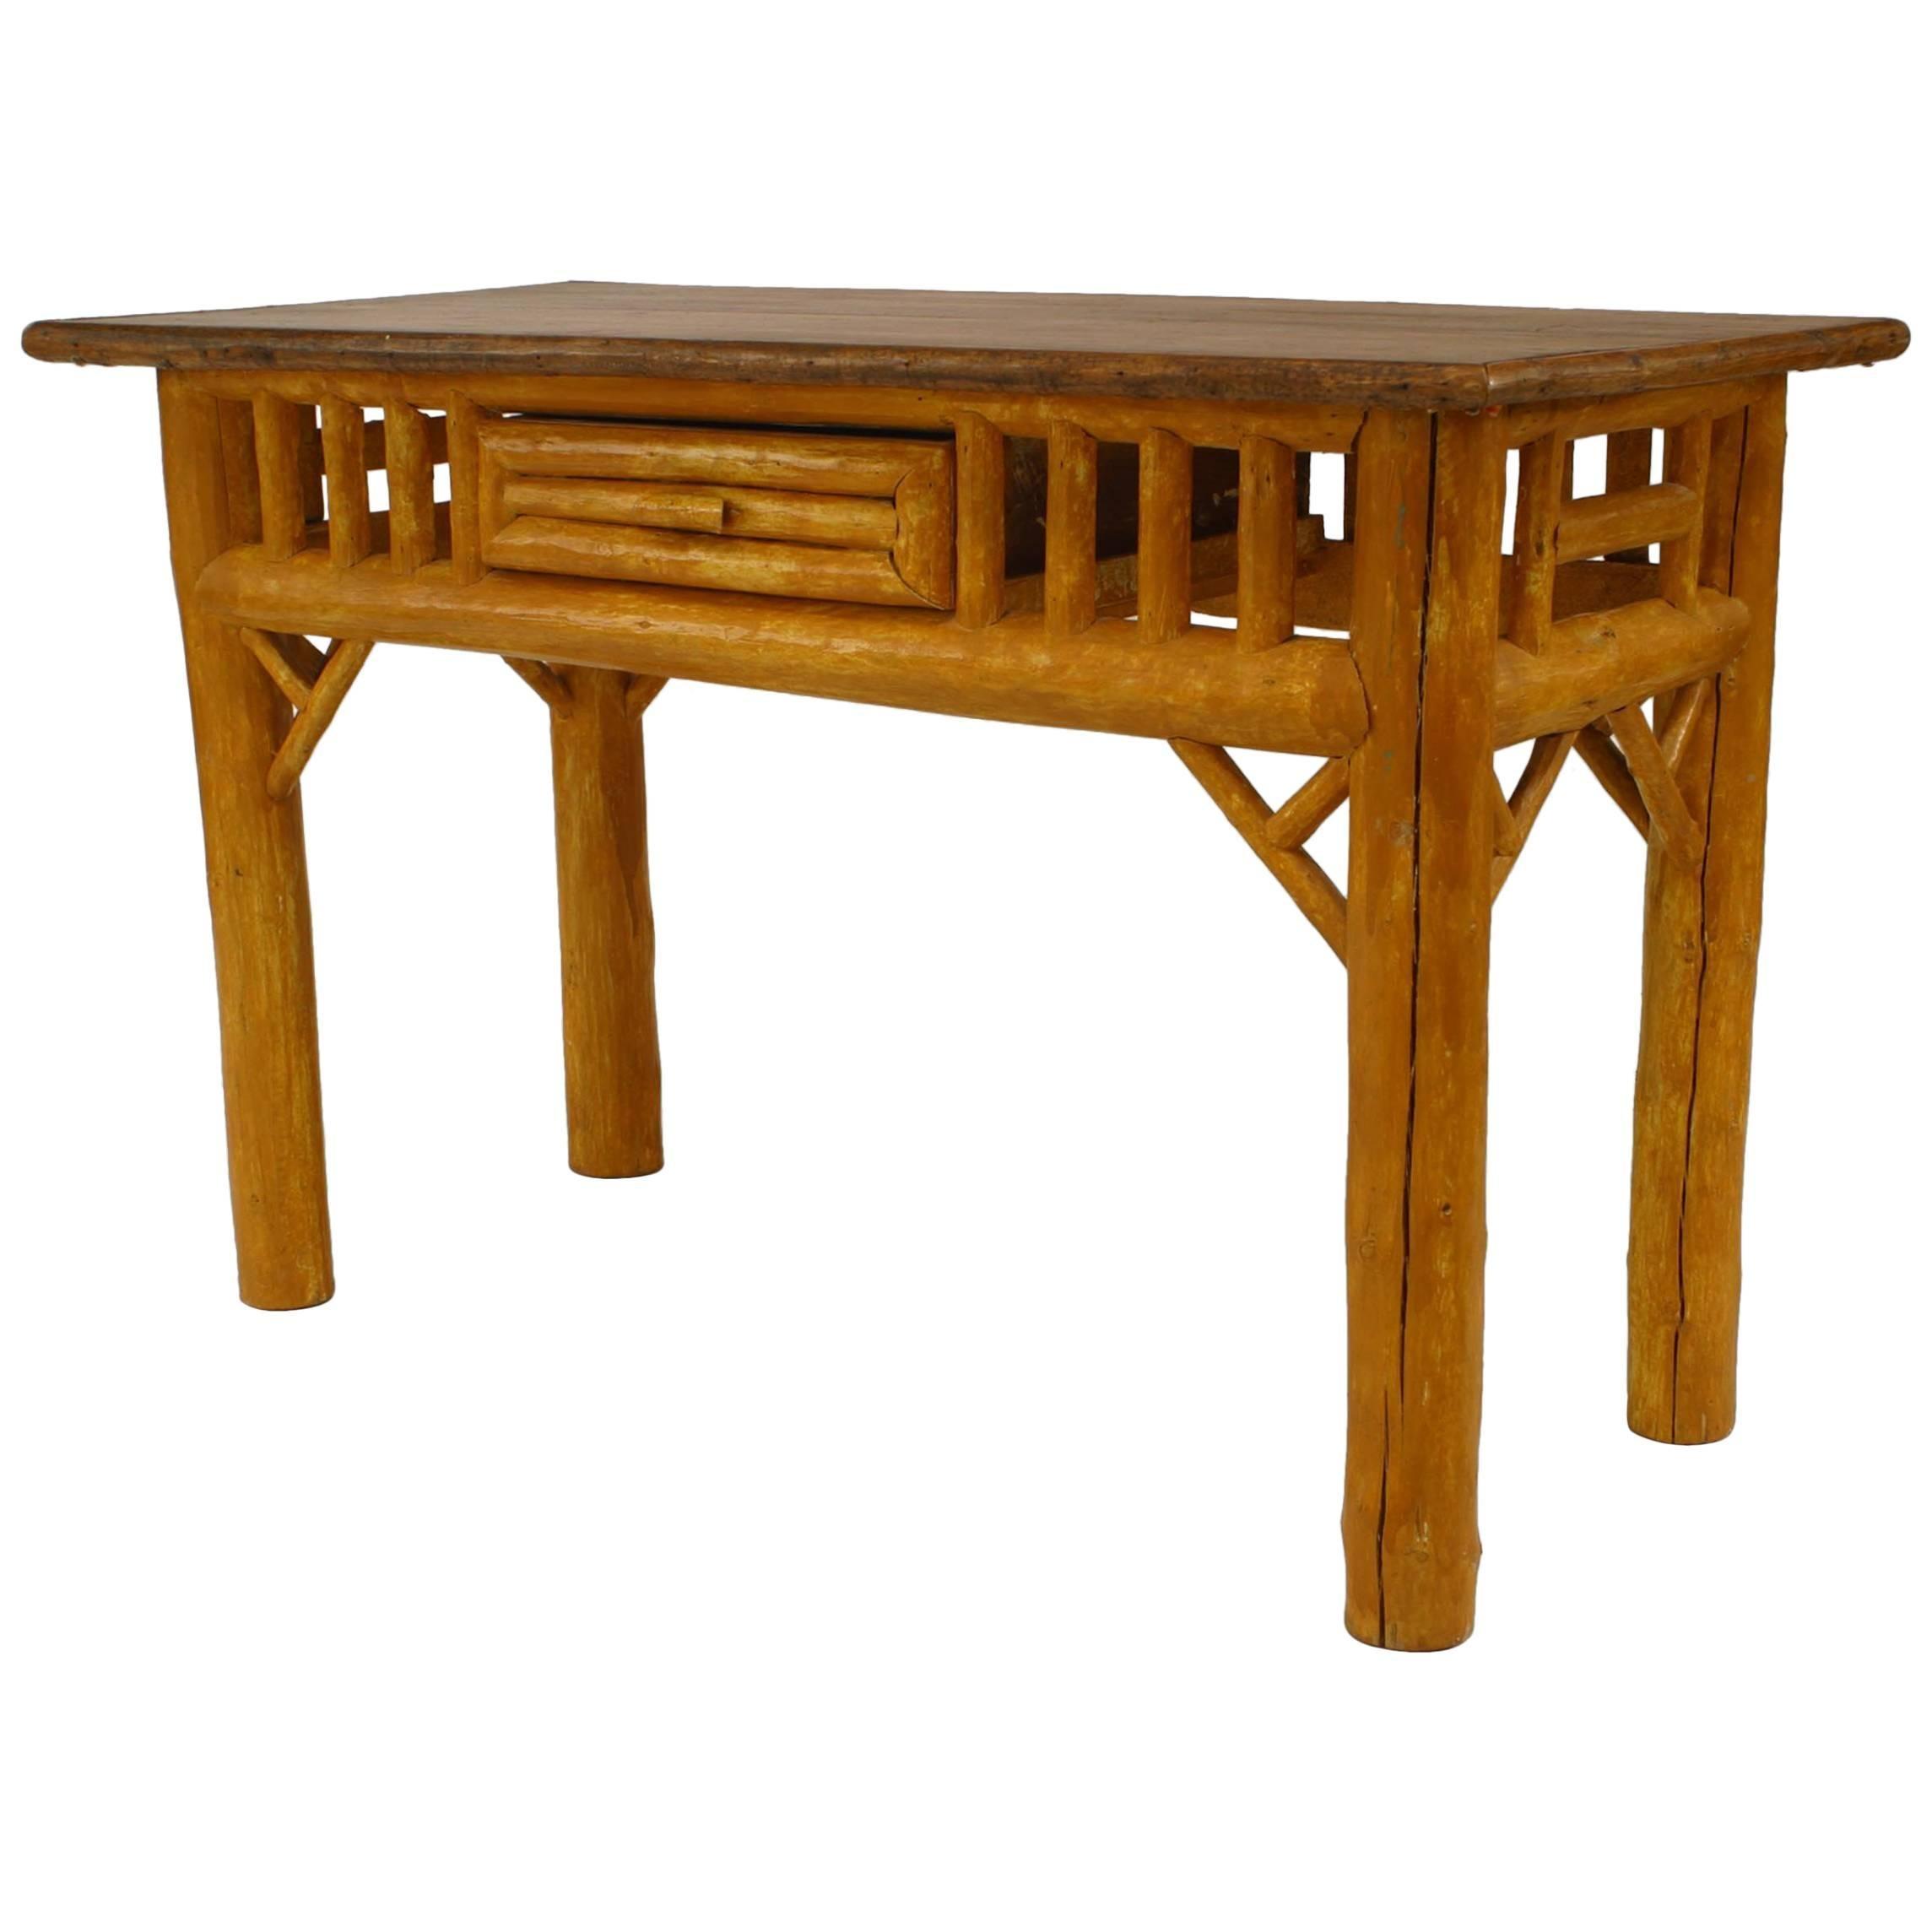 American Rustic Adirondack Painted Cedar Table Desk